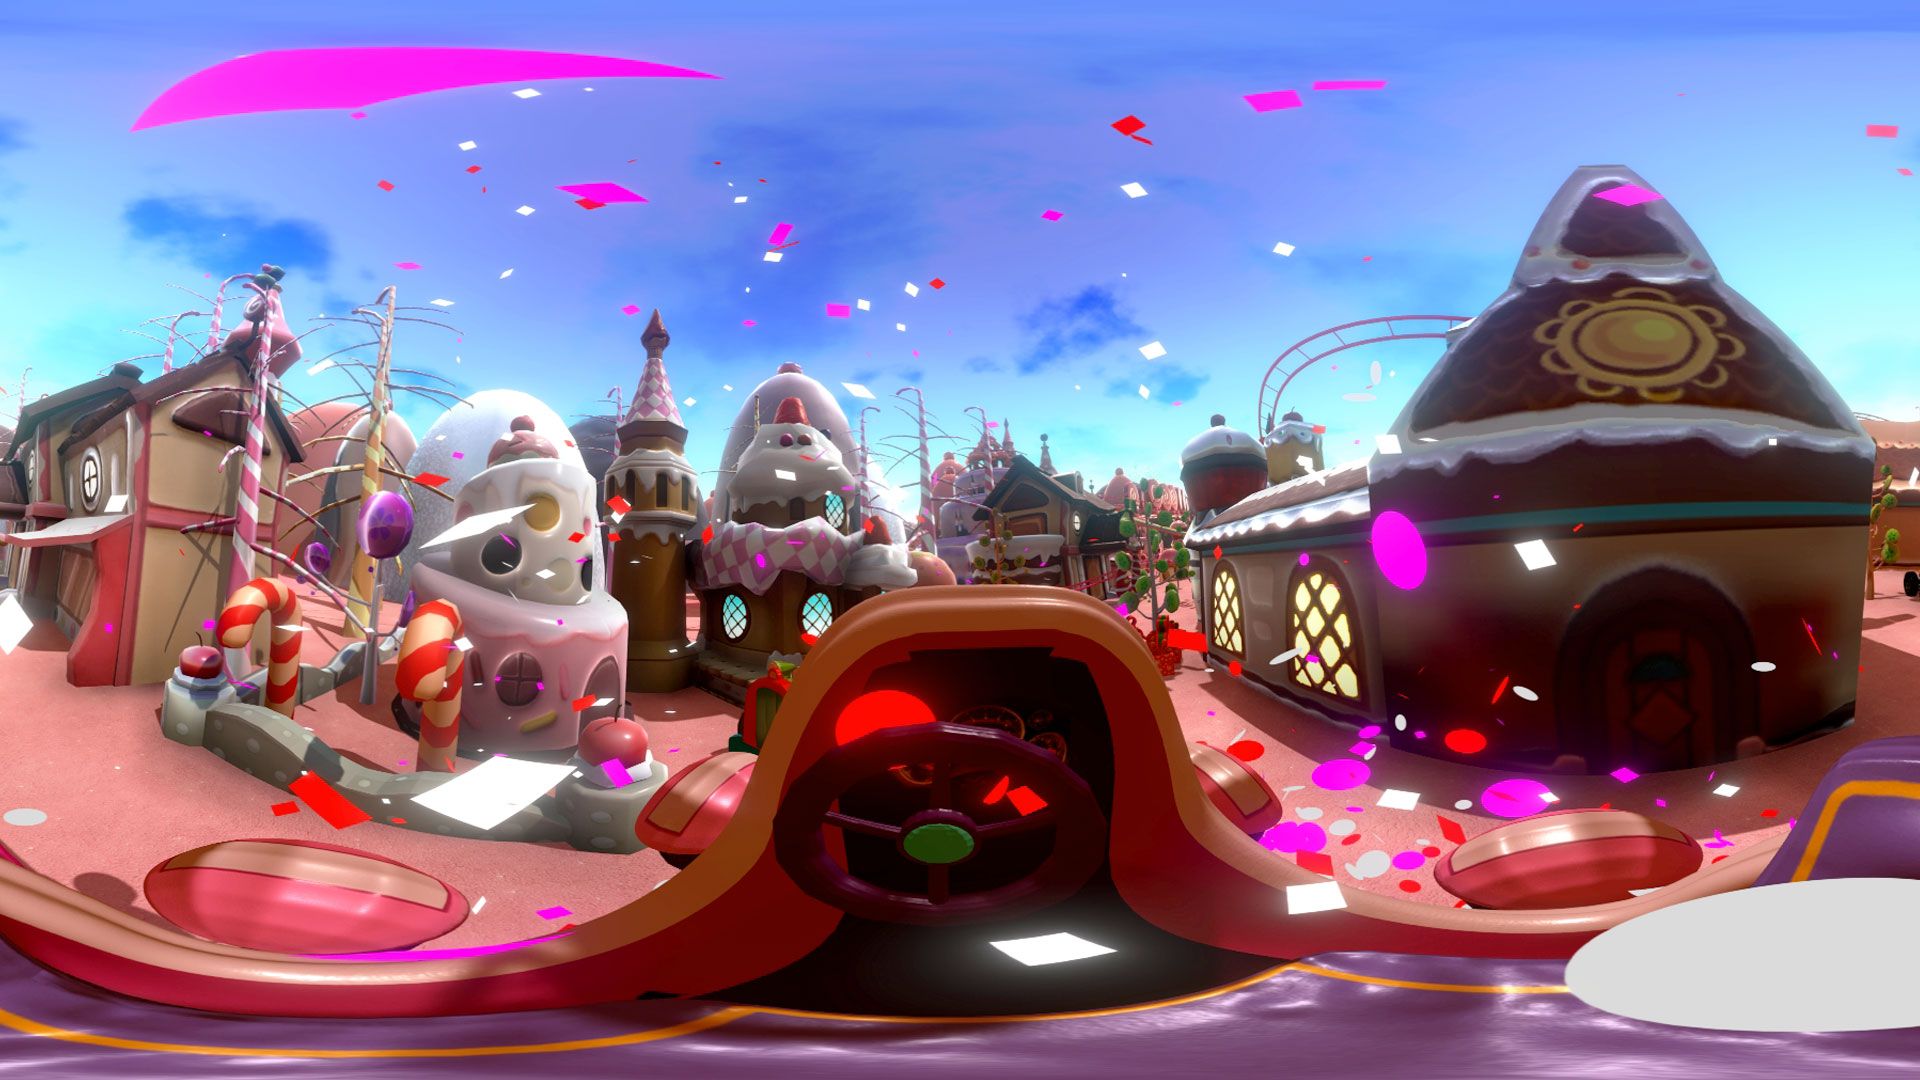 Candy world VR